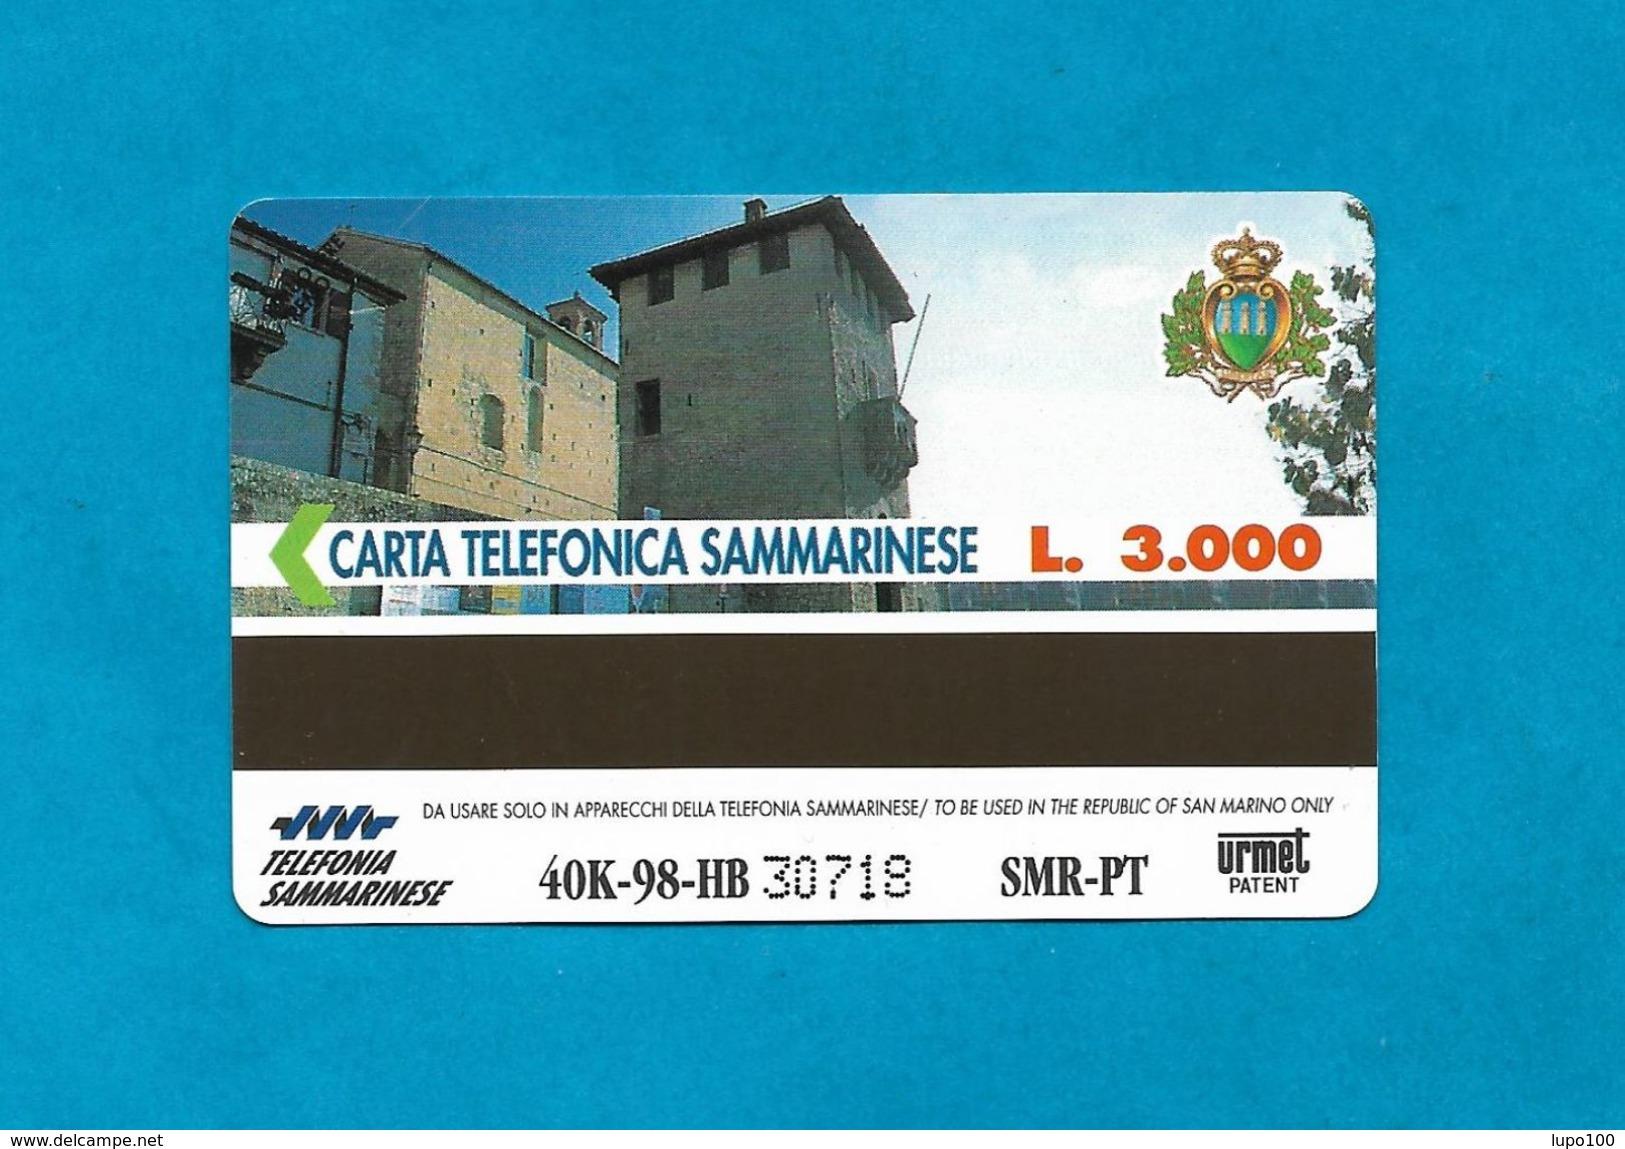 SAN MARINO SCHEDA TELEFONICA NUOVA NEW PHONECARD 40 - SEGNI ZODIACALI LEONE - San Marino